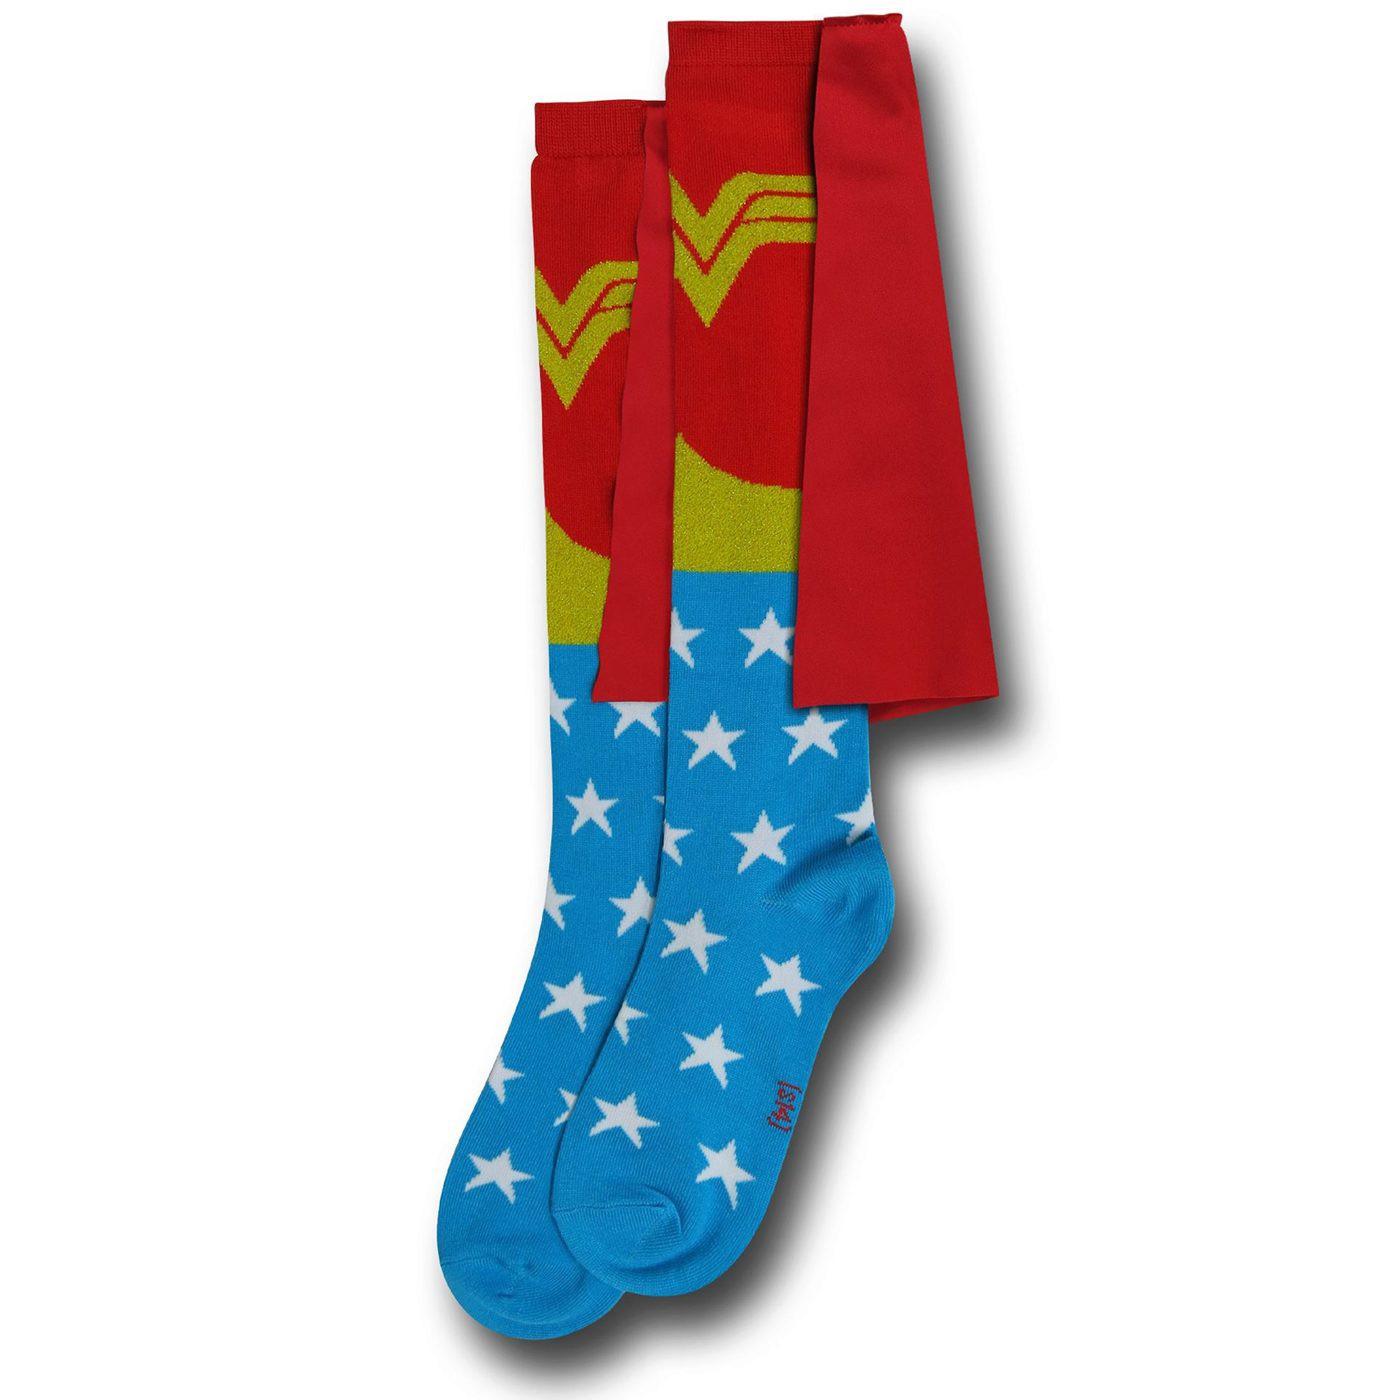 Wonder Woman Women's Knee-High Socks w/Capes